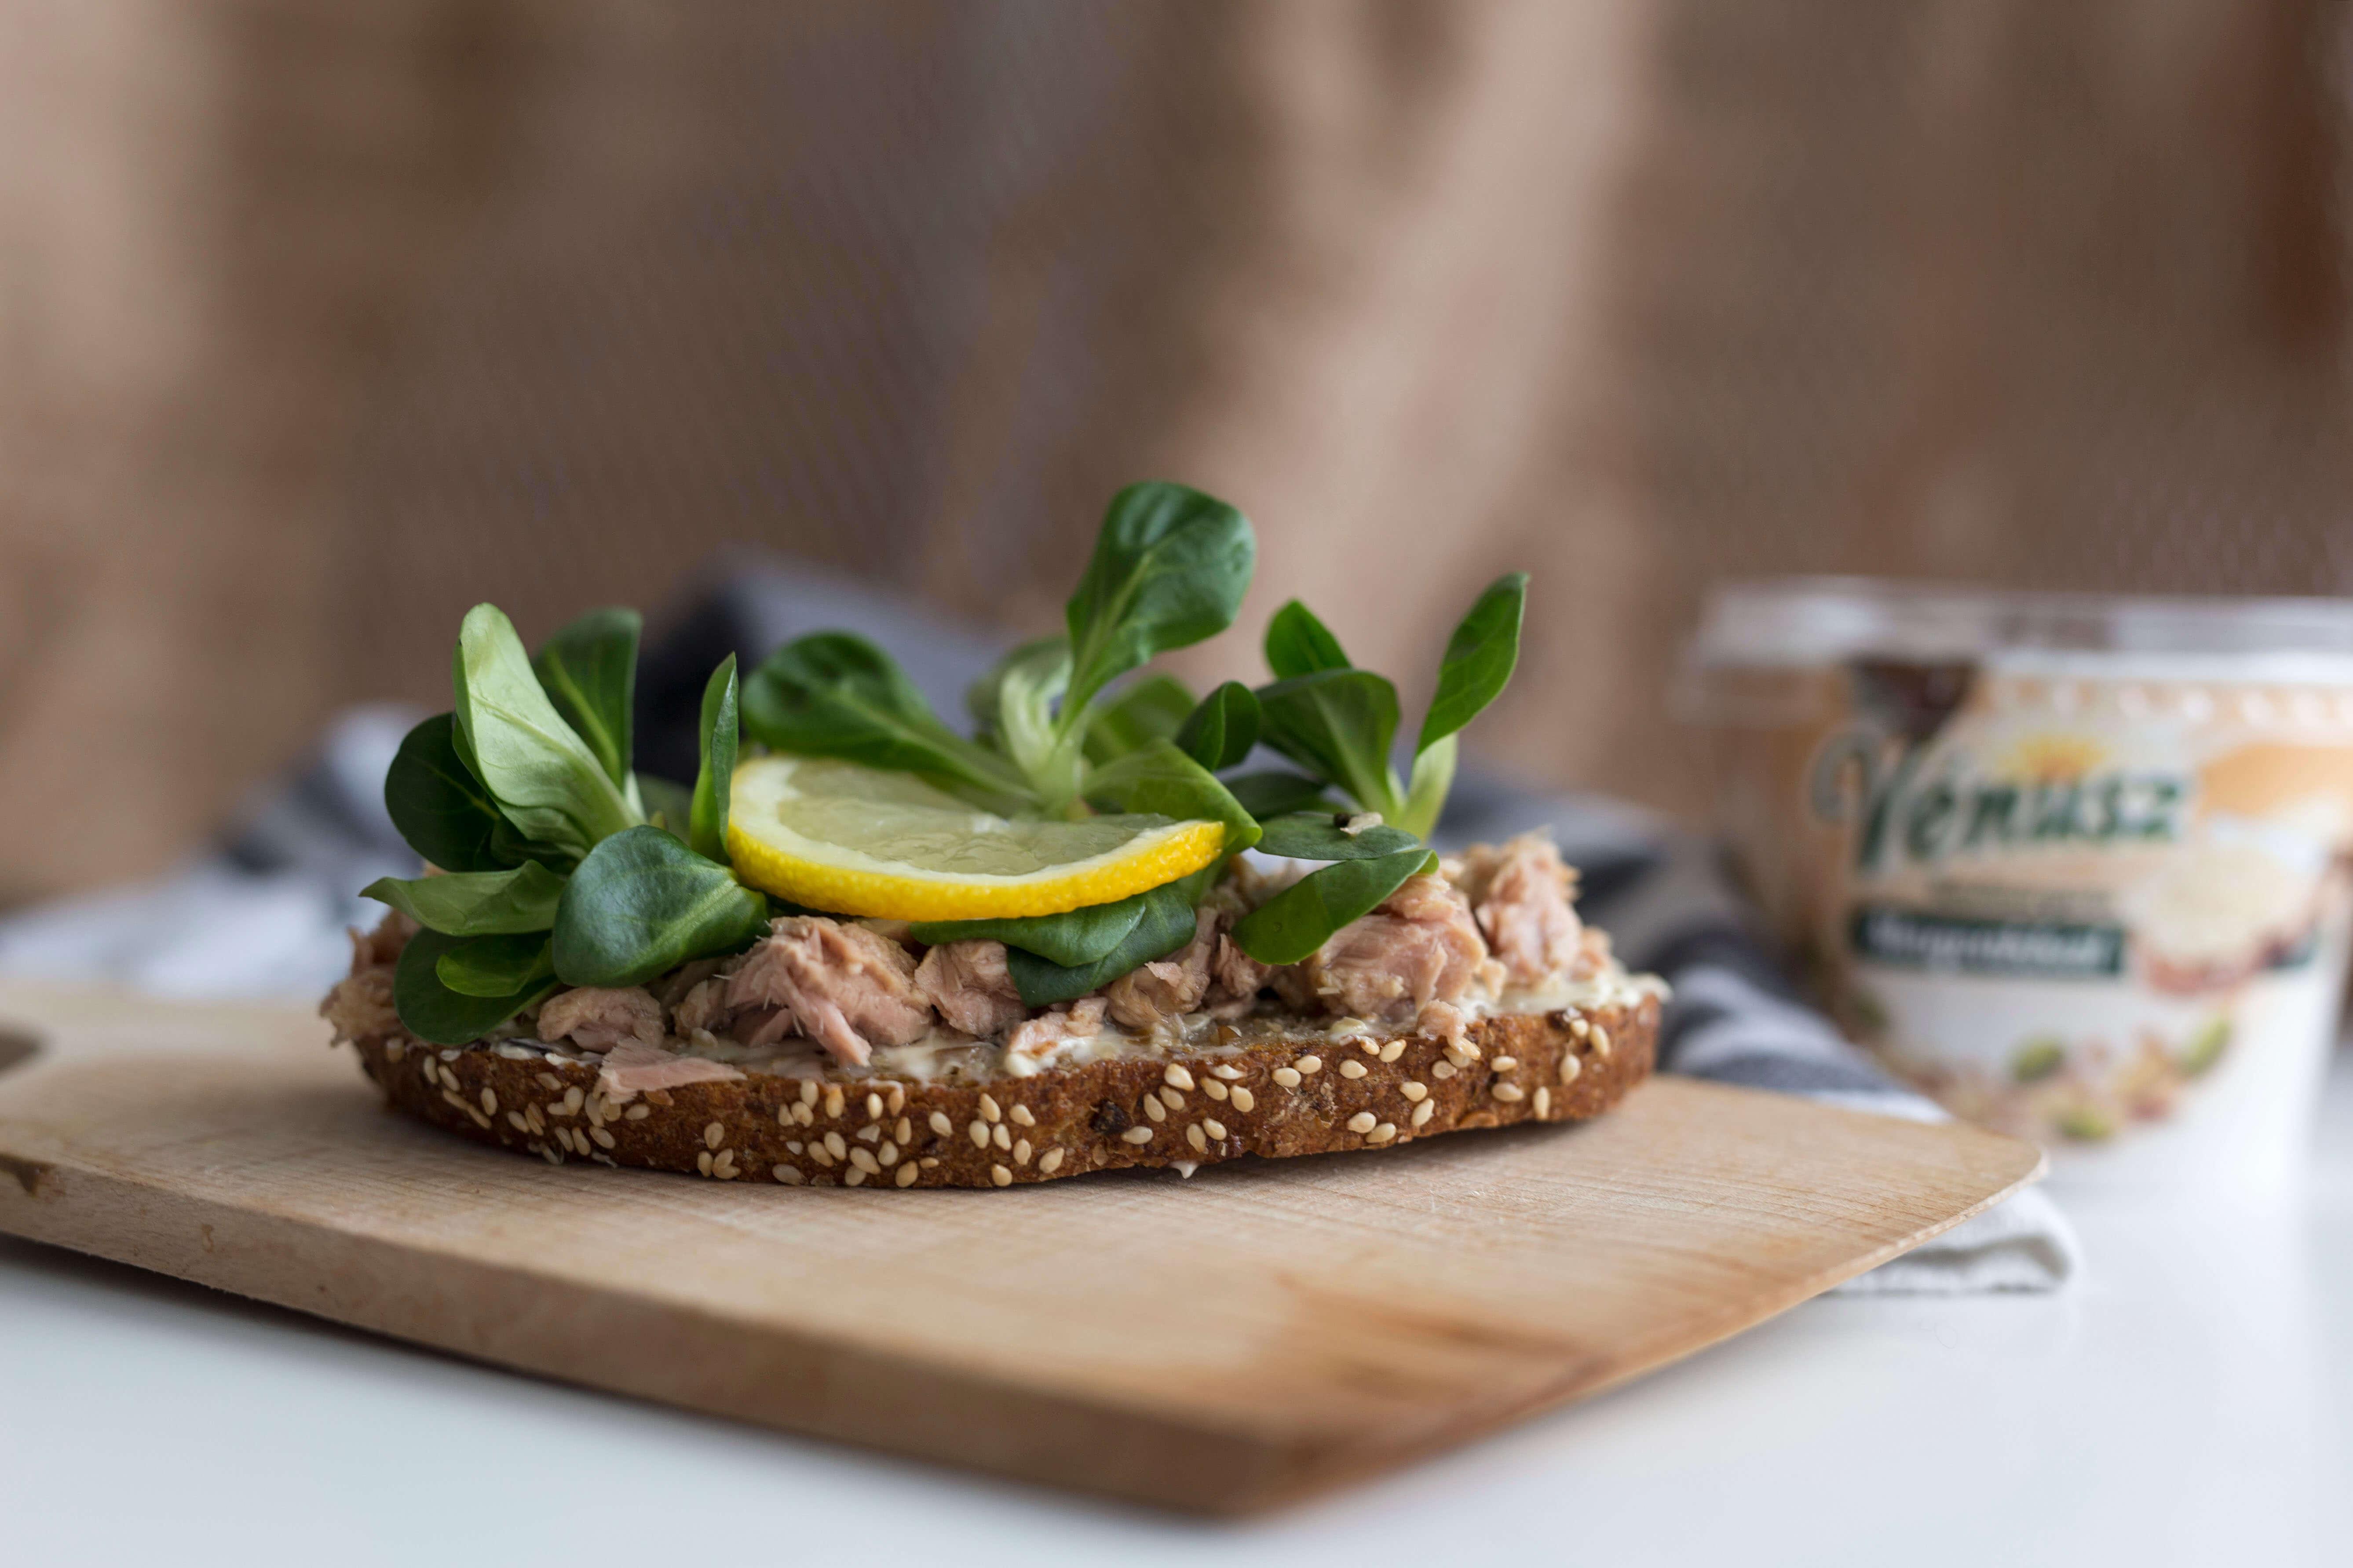 Tuna sandwich, Recipe, Gastronomy, Health, Fitness, Workout